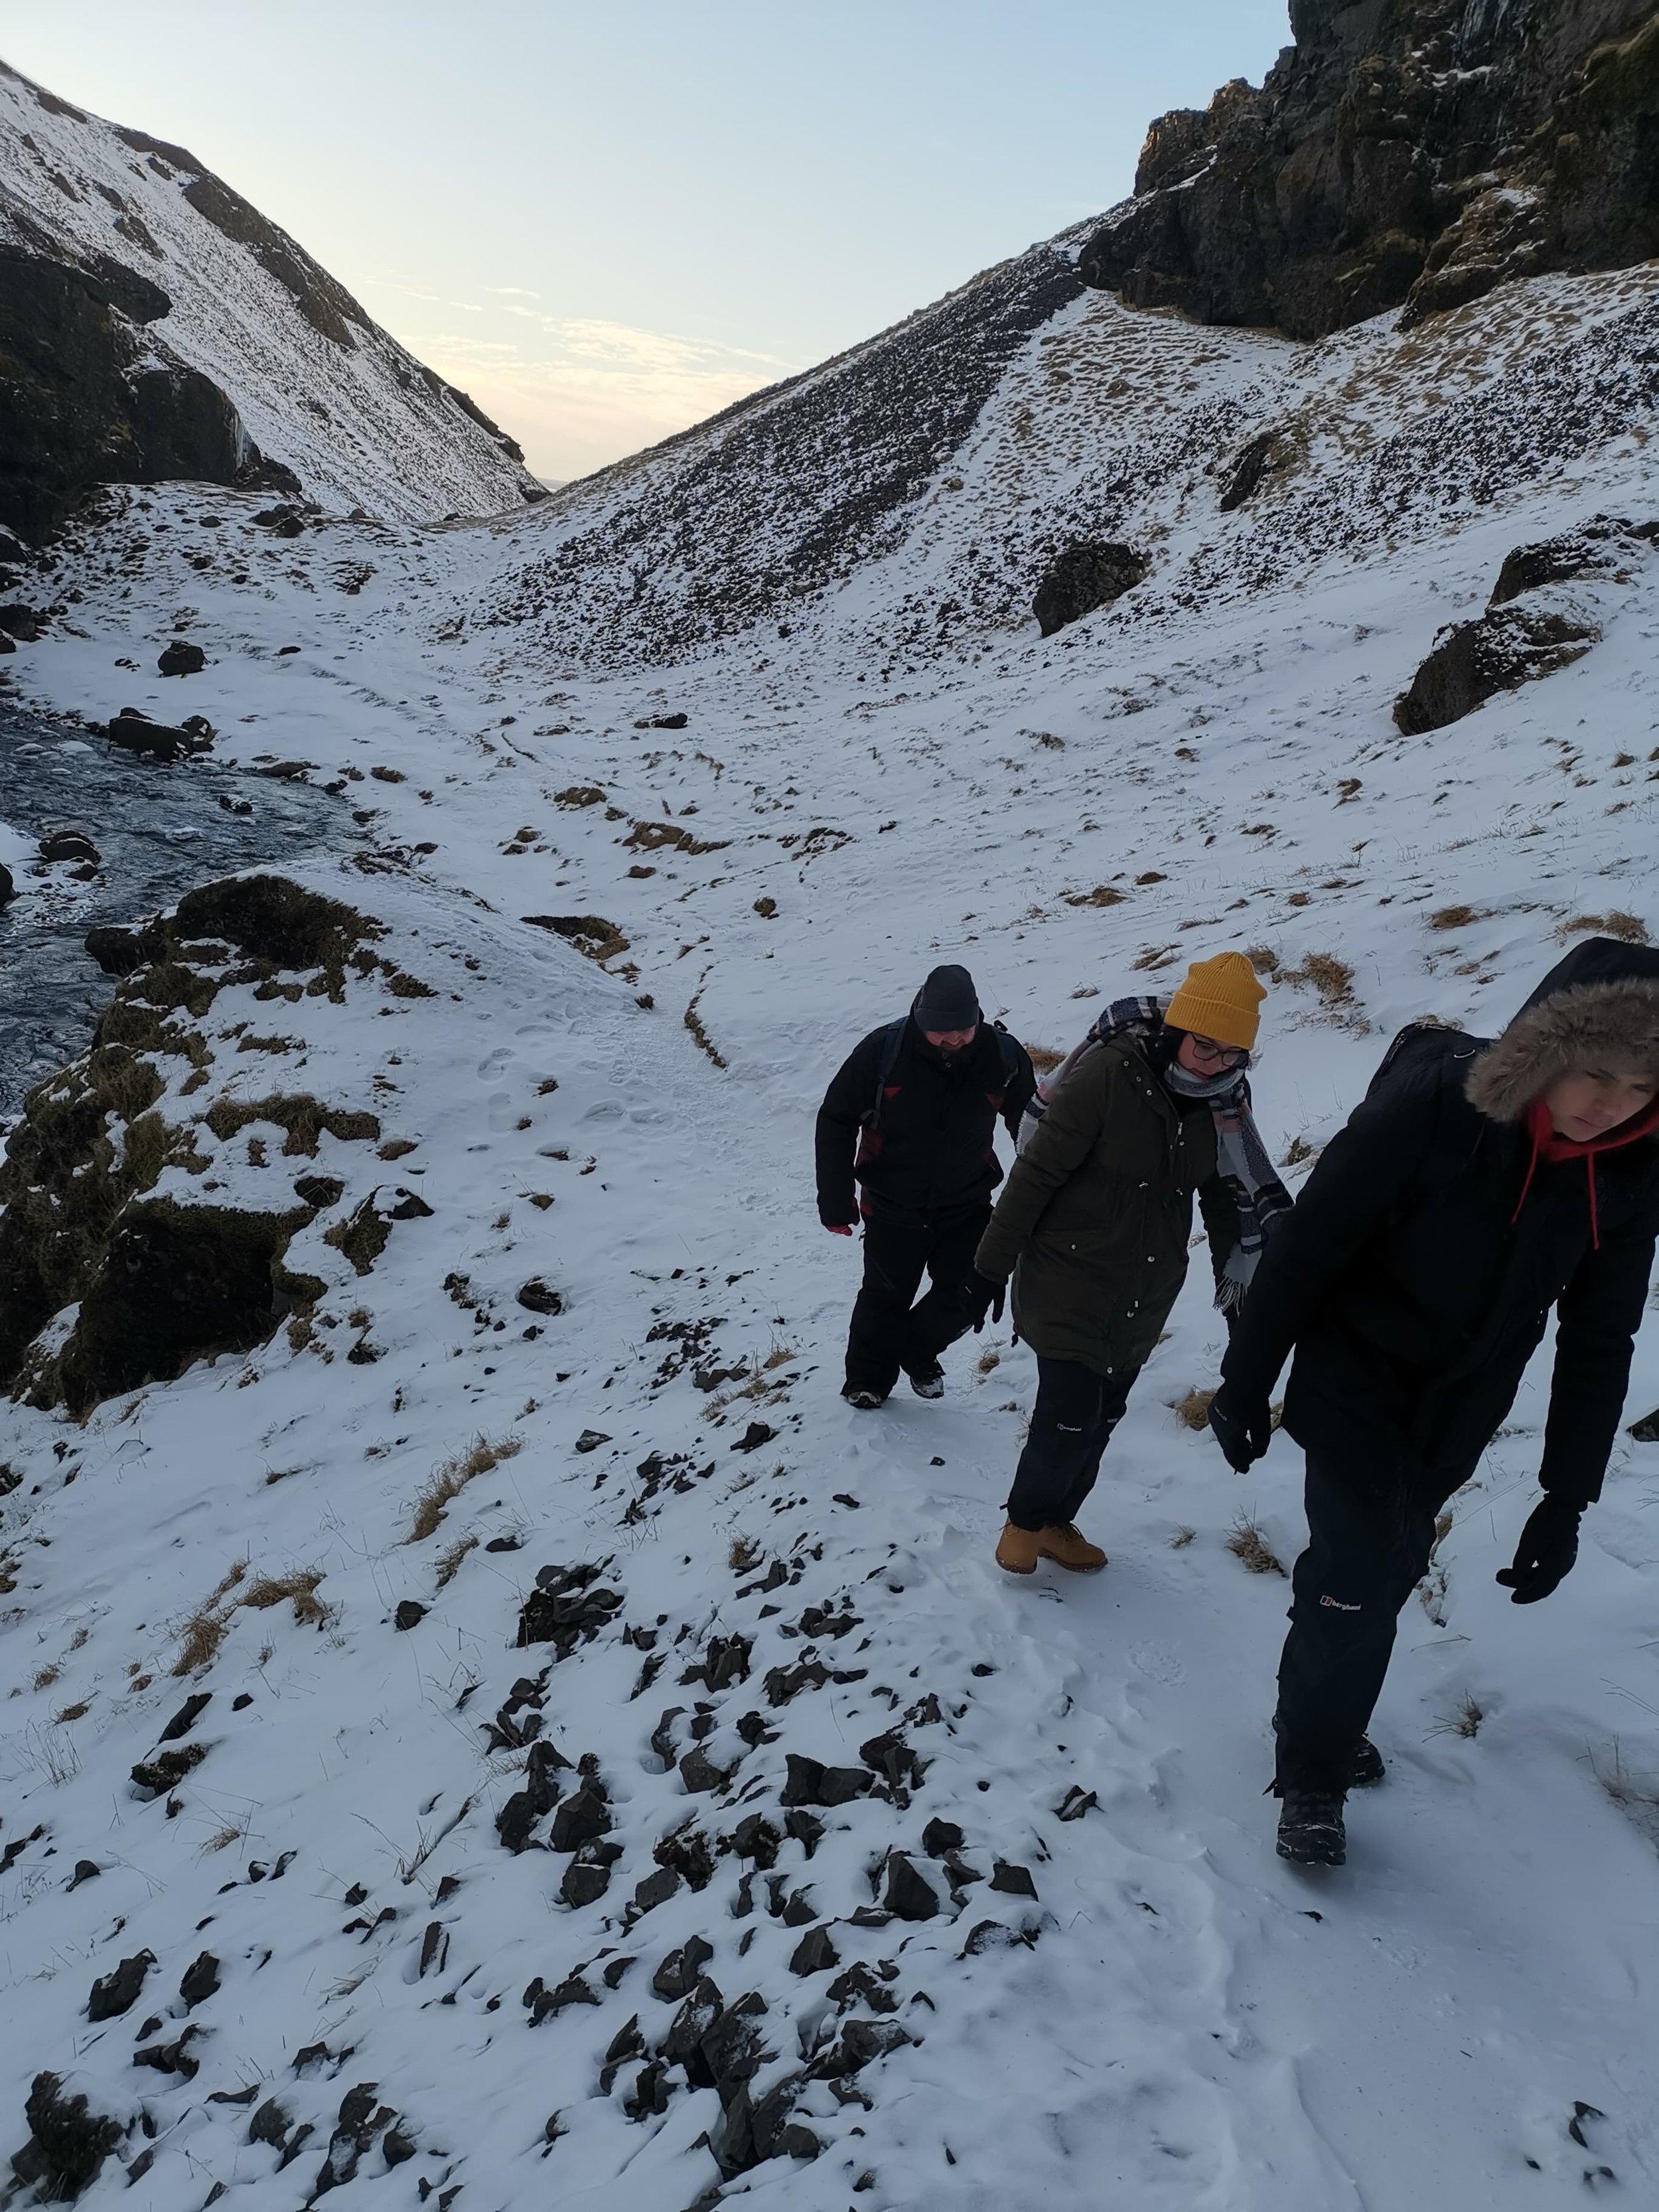 Iceland. snow. travel. adventure. photography. trip. epic landscape. snow. cold. freezing. sunrise. on the trail.jpg